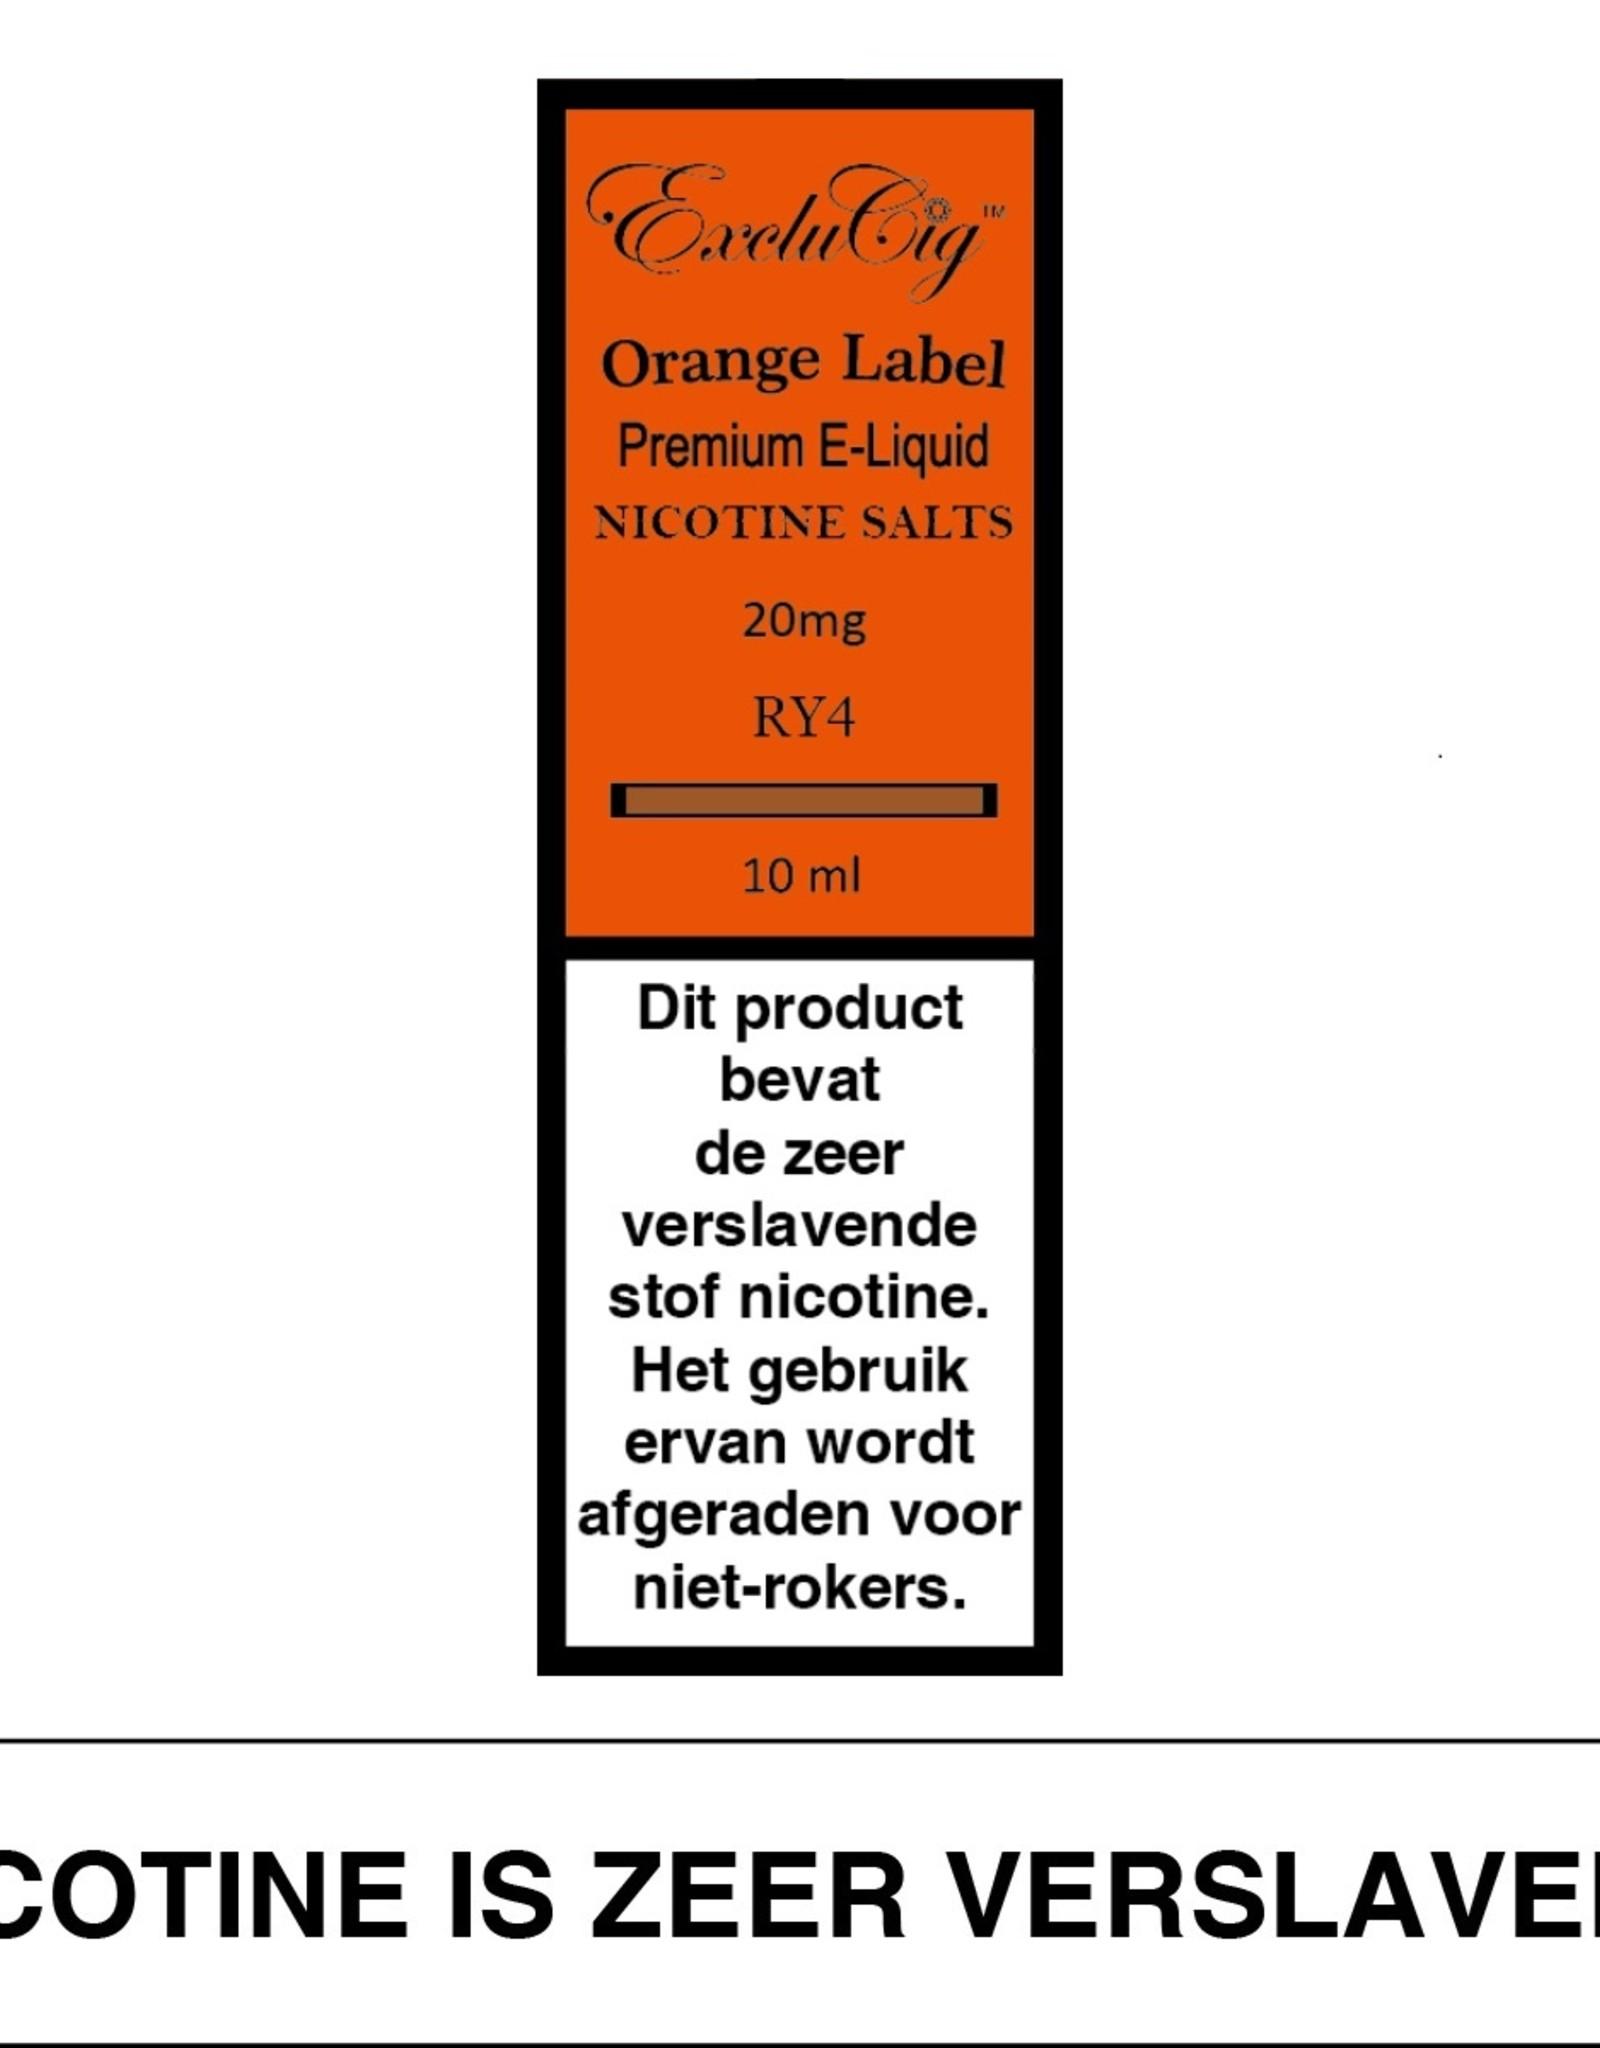 Exclucig Exclucig Orange Label E-liquid RY4 20 mg Nicotinezout